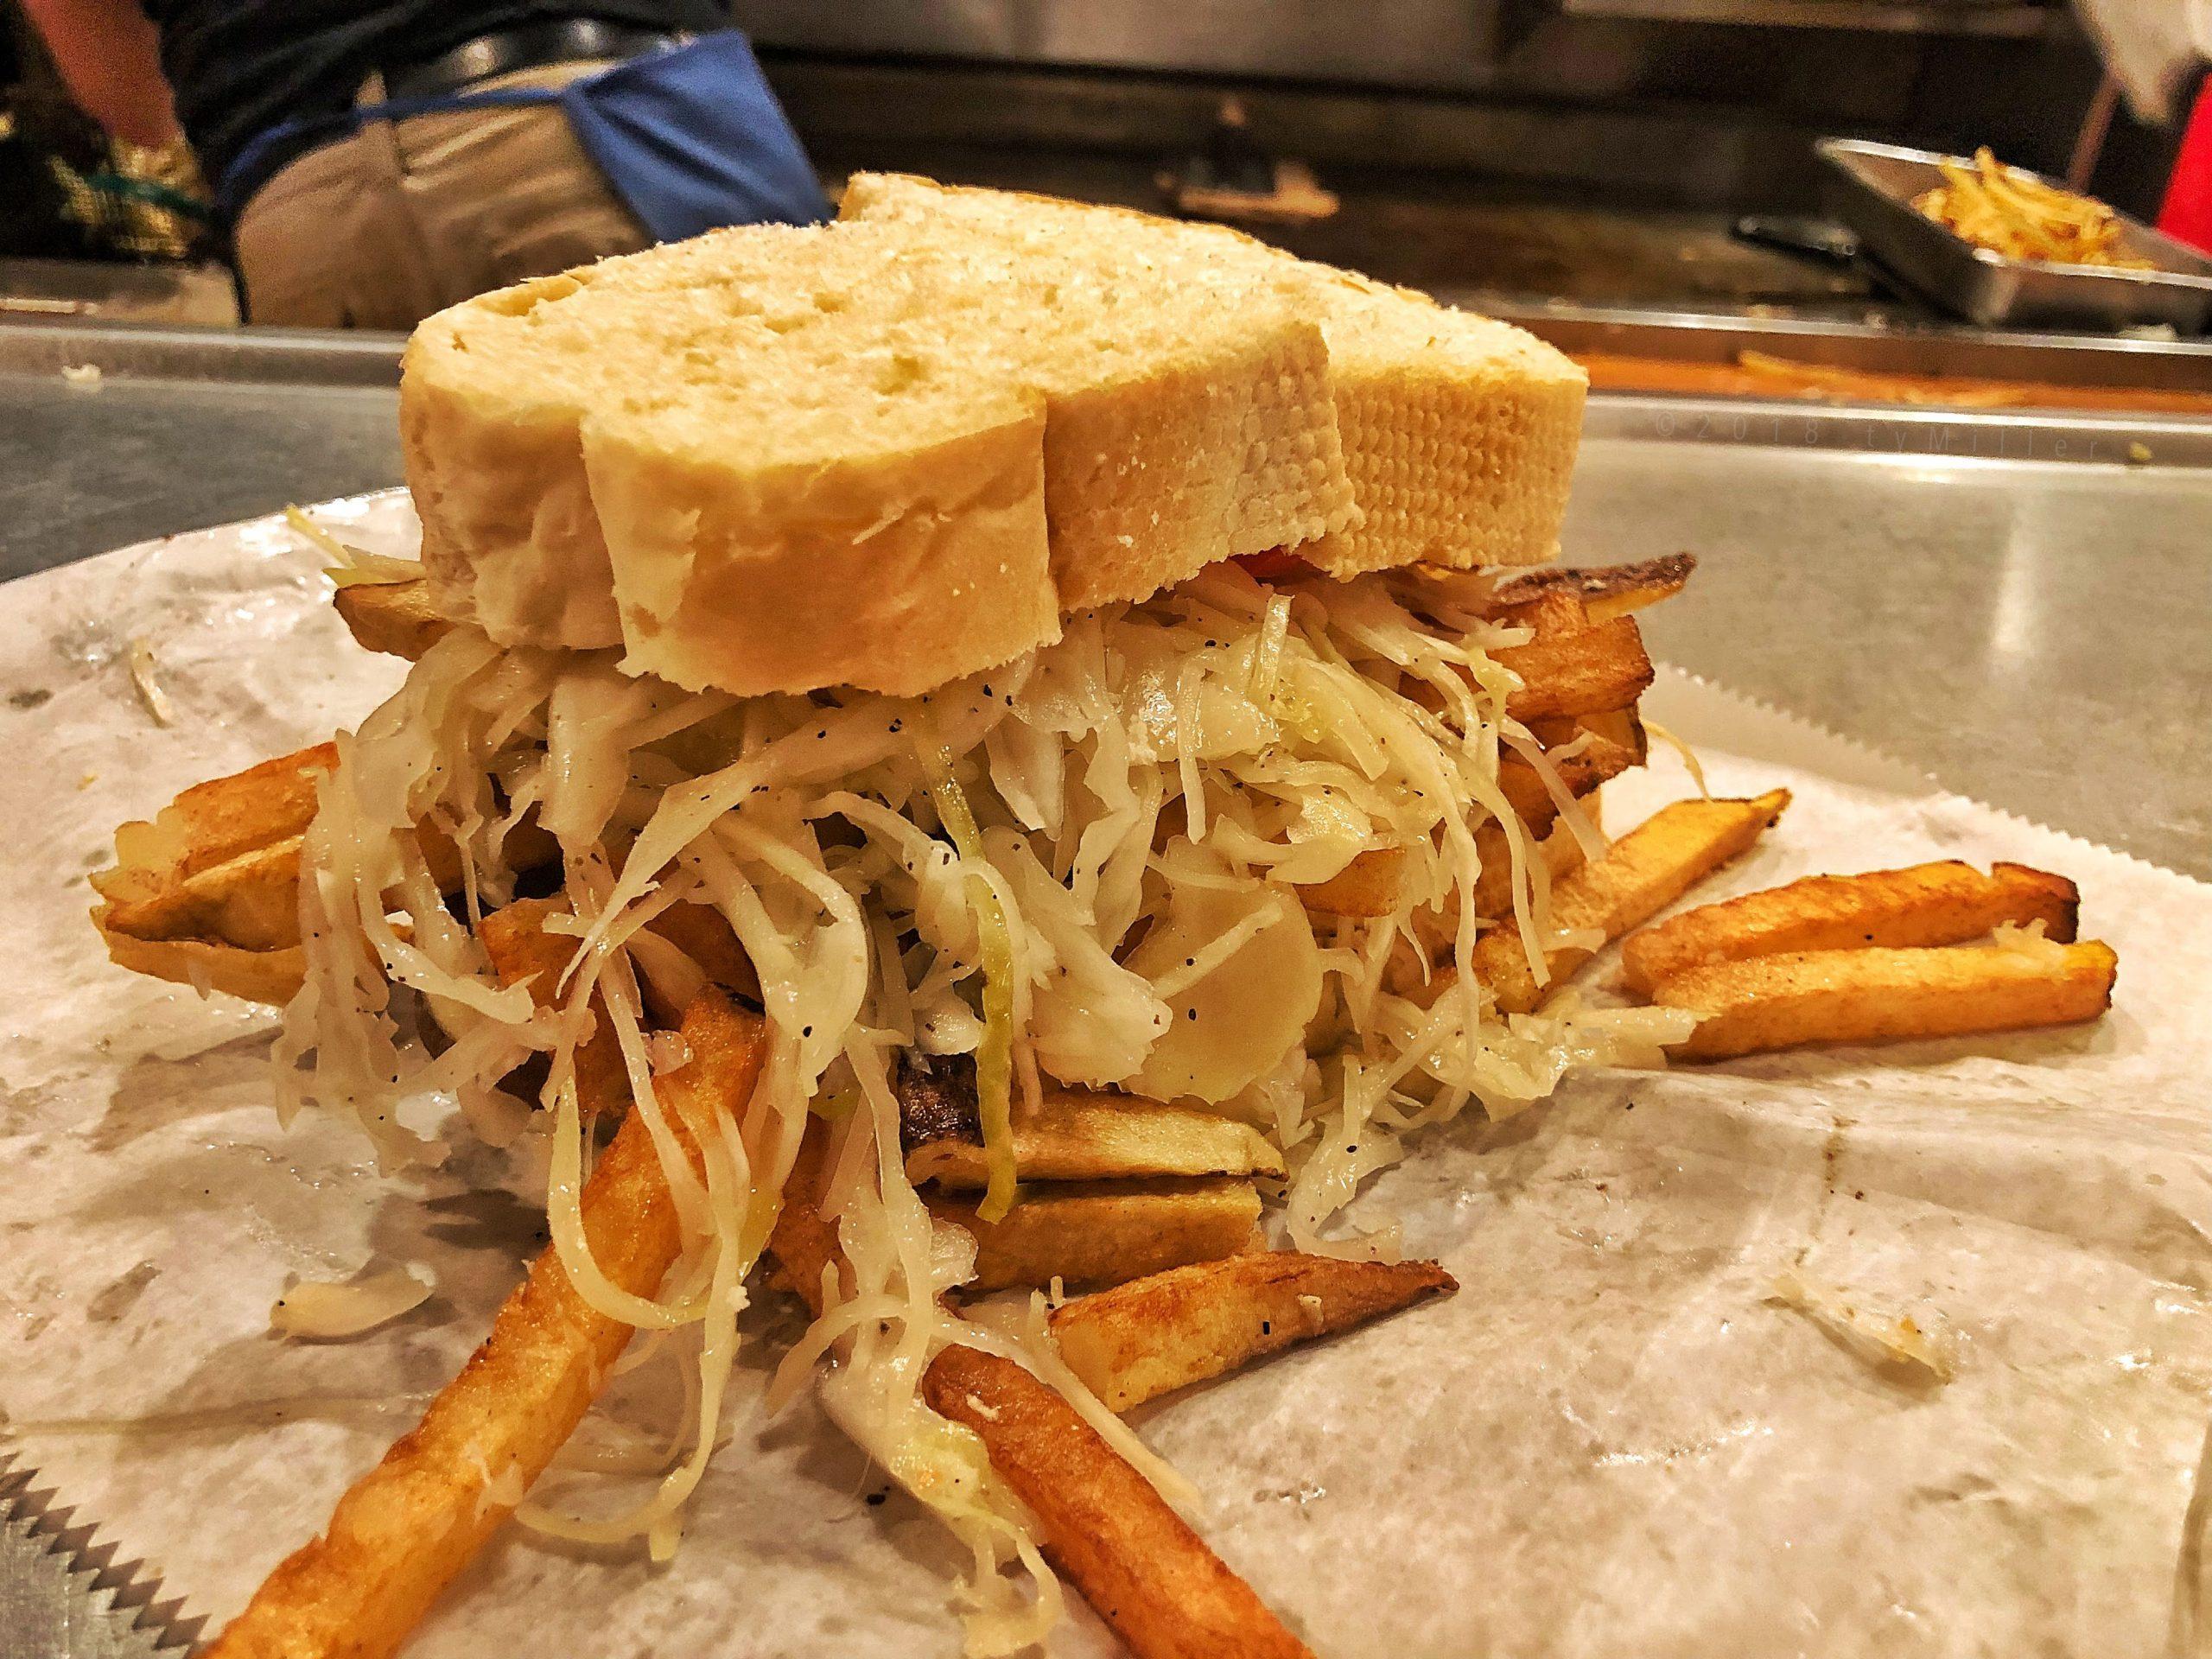 Pitts-burger